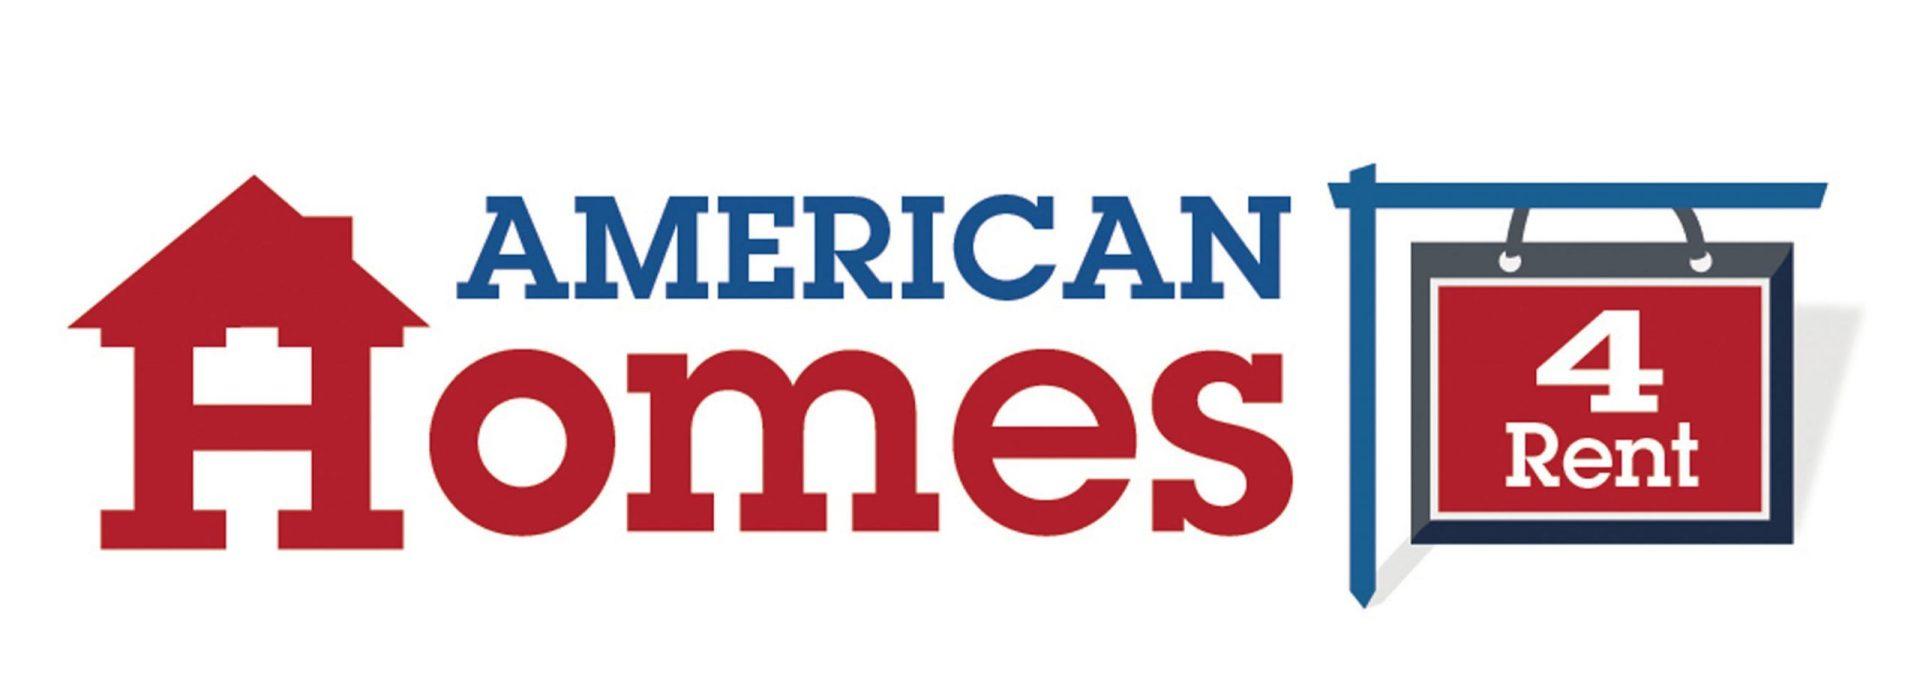 AMERICAN HOMES 4 RENT LOGO